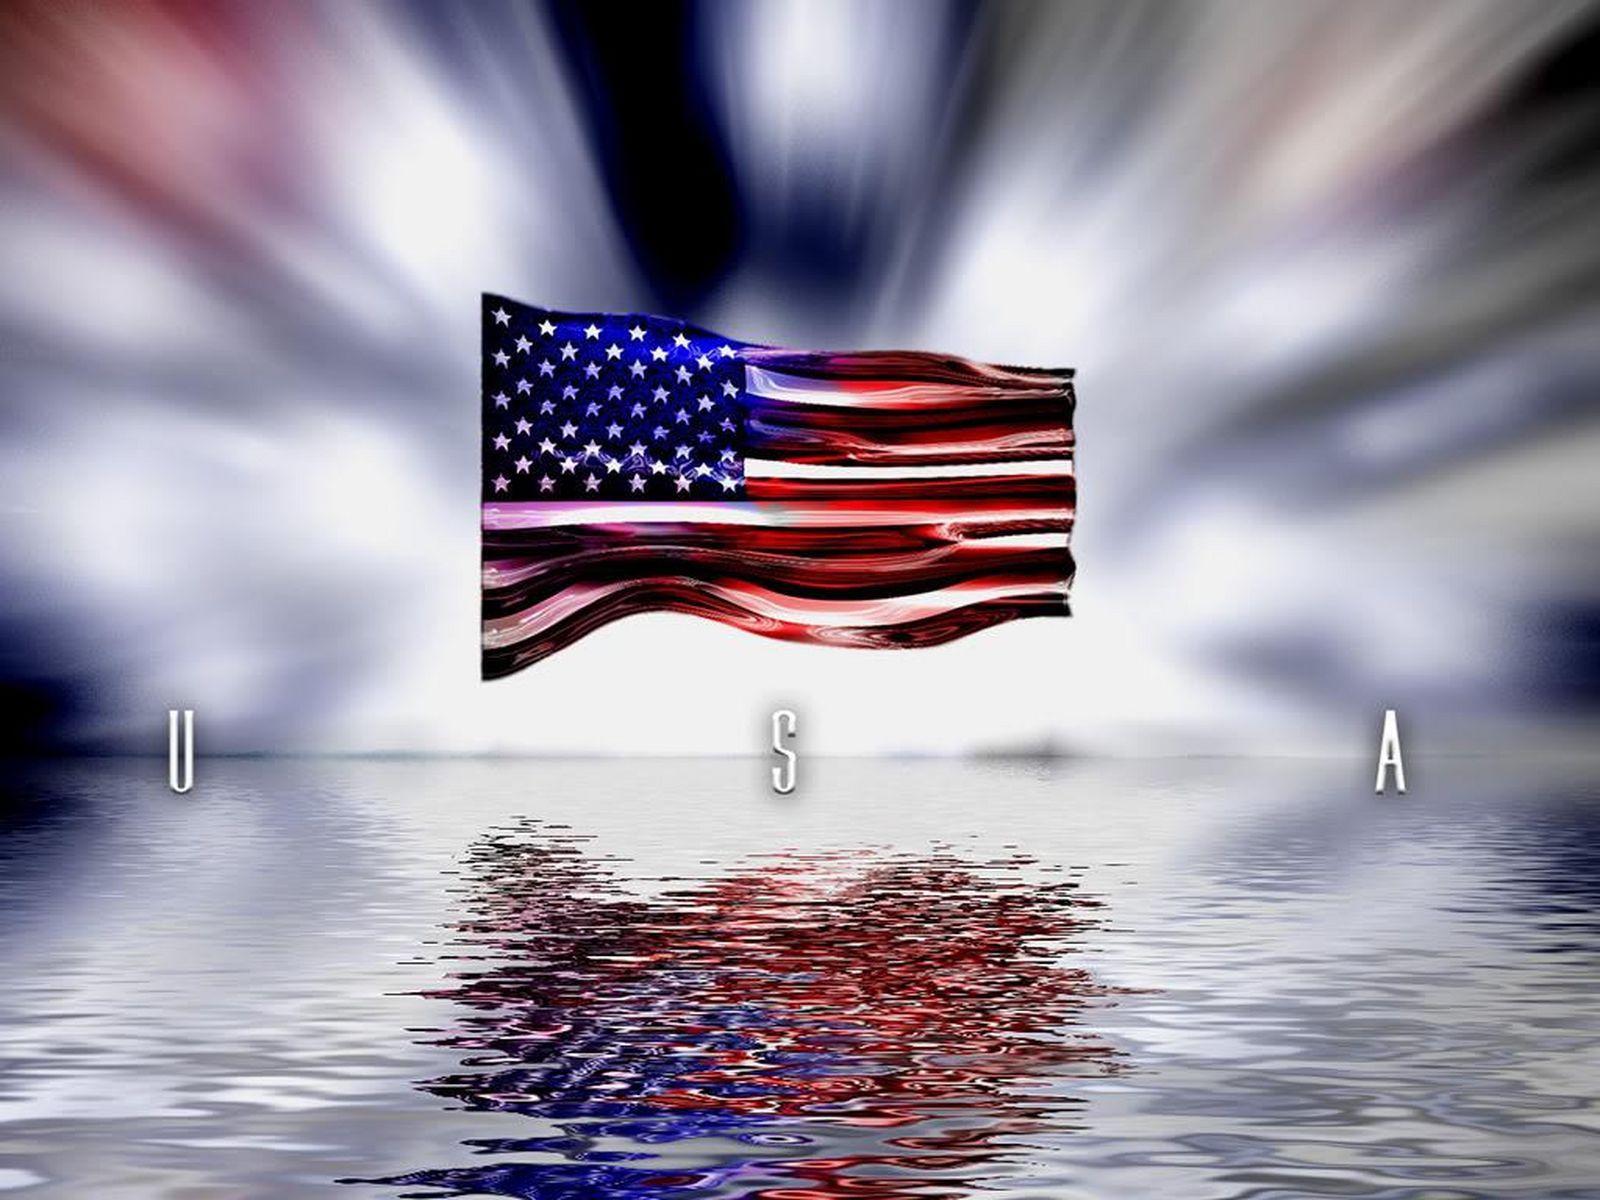 American Flag Desktop Wallpaper US Flag Photos Cool Wallpapers